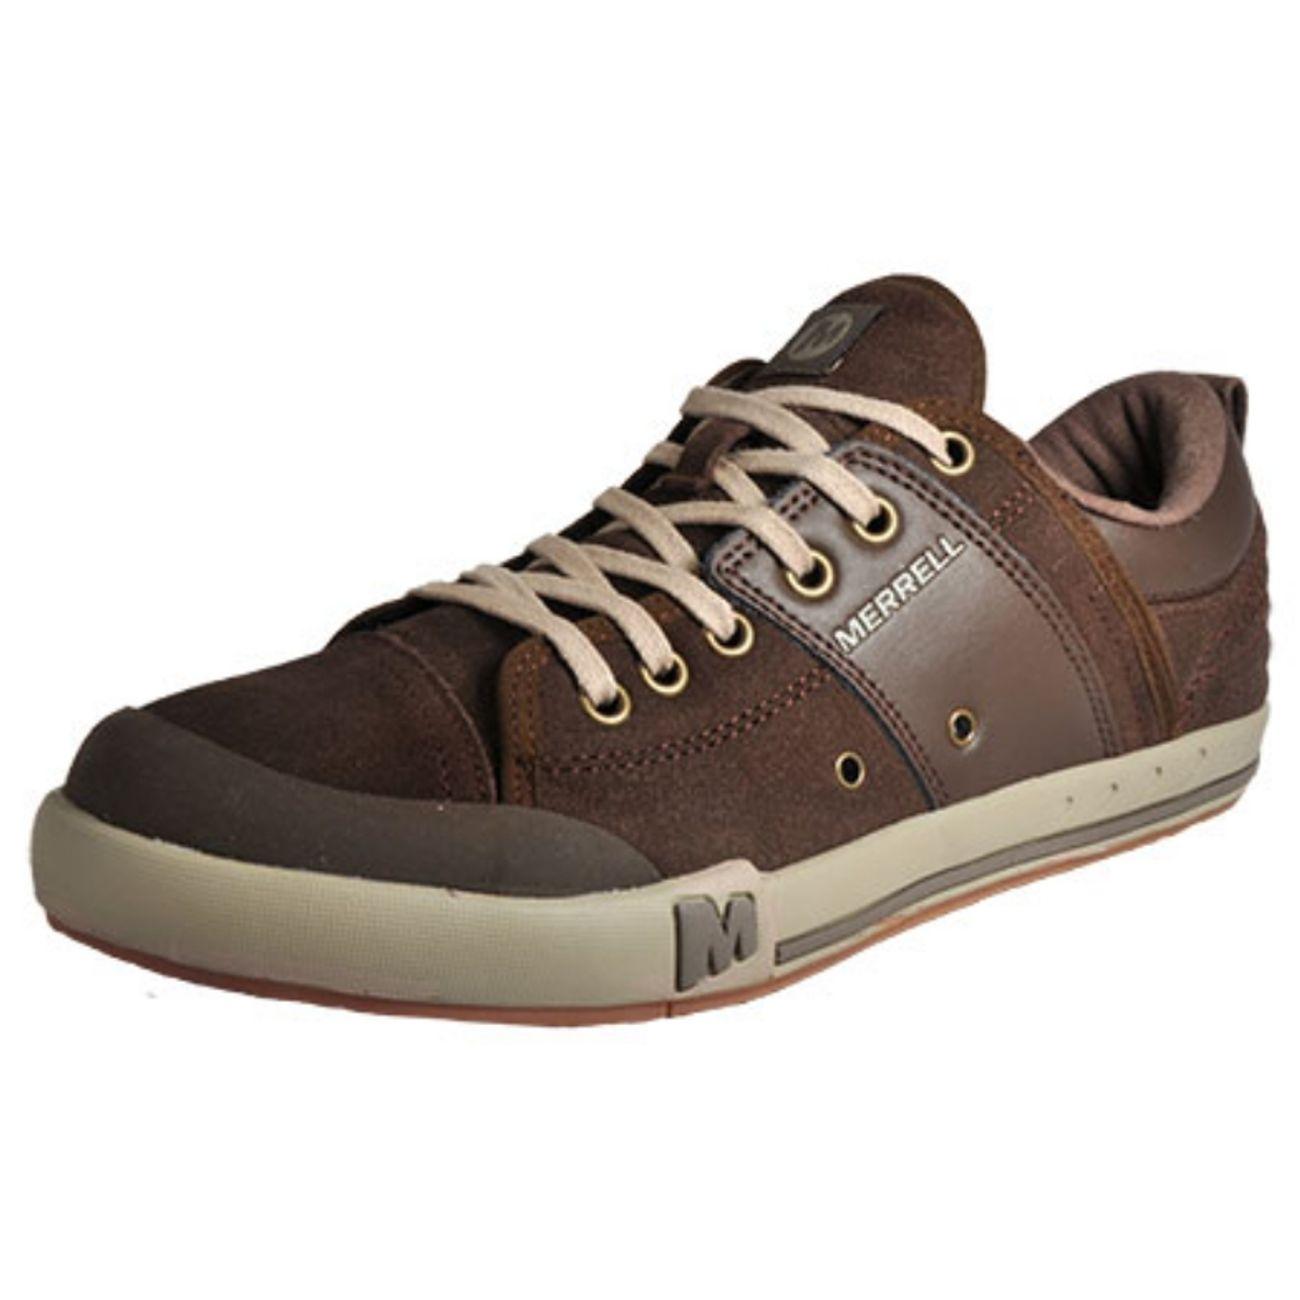 Rant Dash Achat Et Chaussures Hommes Prix Merrell Casual – Baskets NvmnwO80